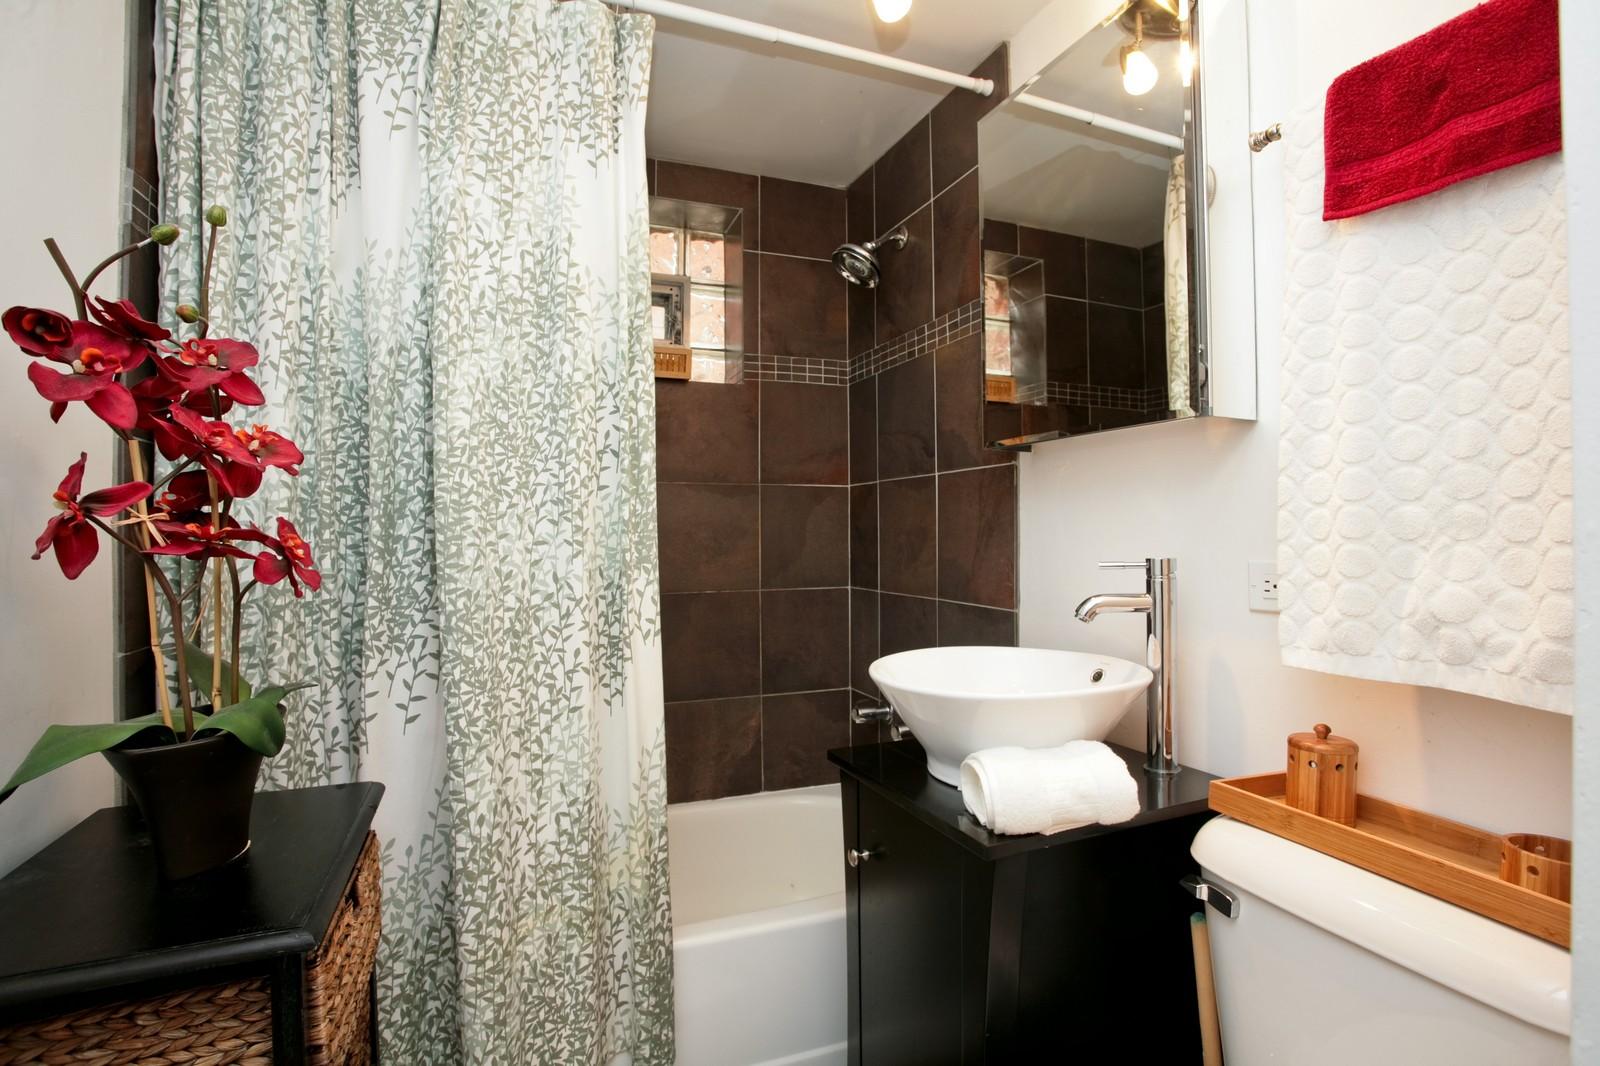 Real Estate Photography - 921 W Sunnyside, Unit Garden, Chicago, IL, 60640 - Bathroom